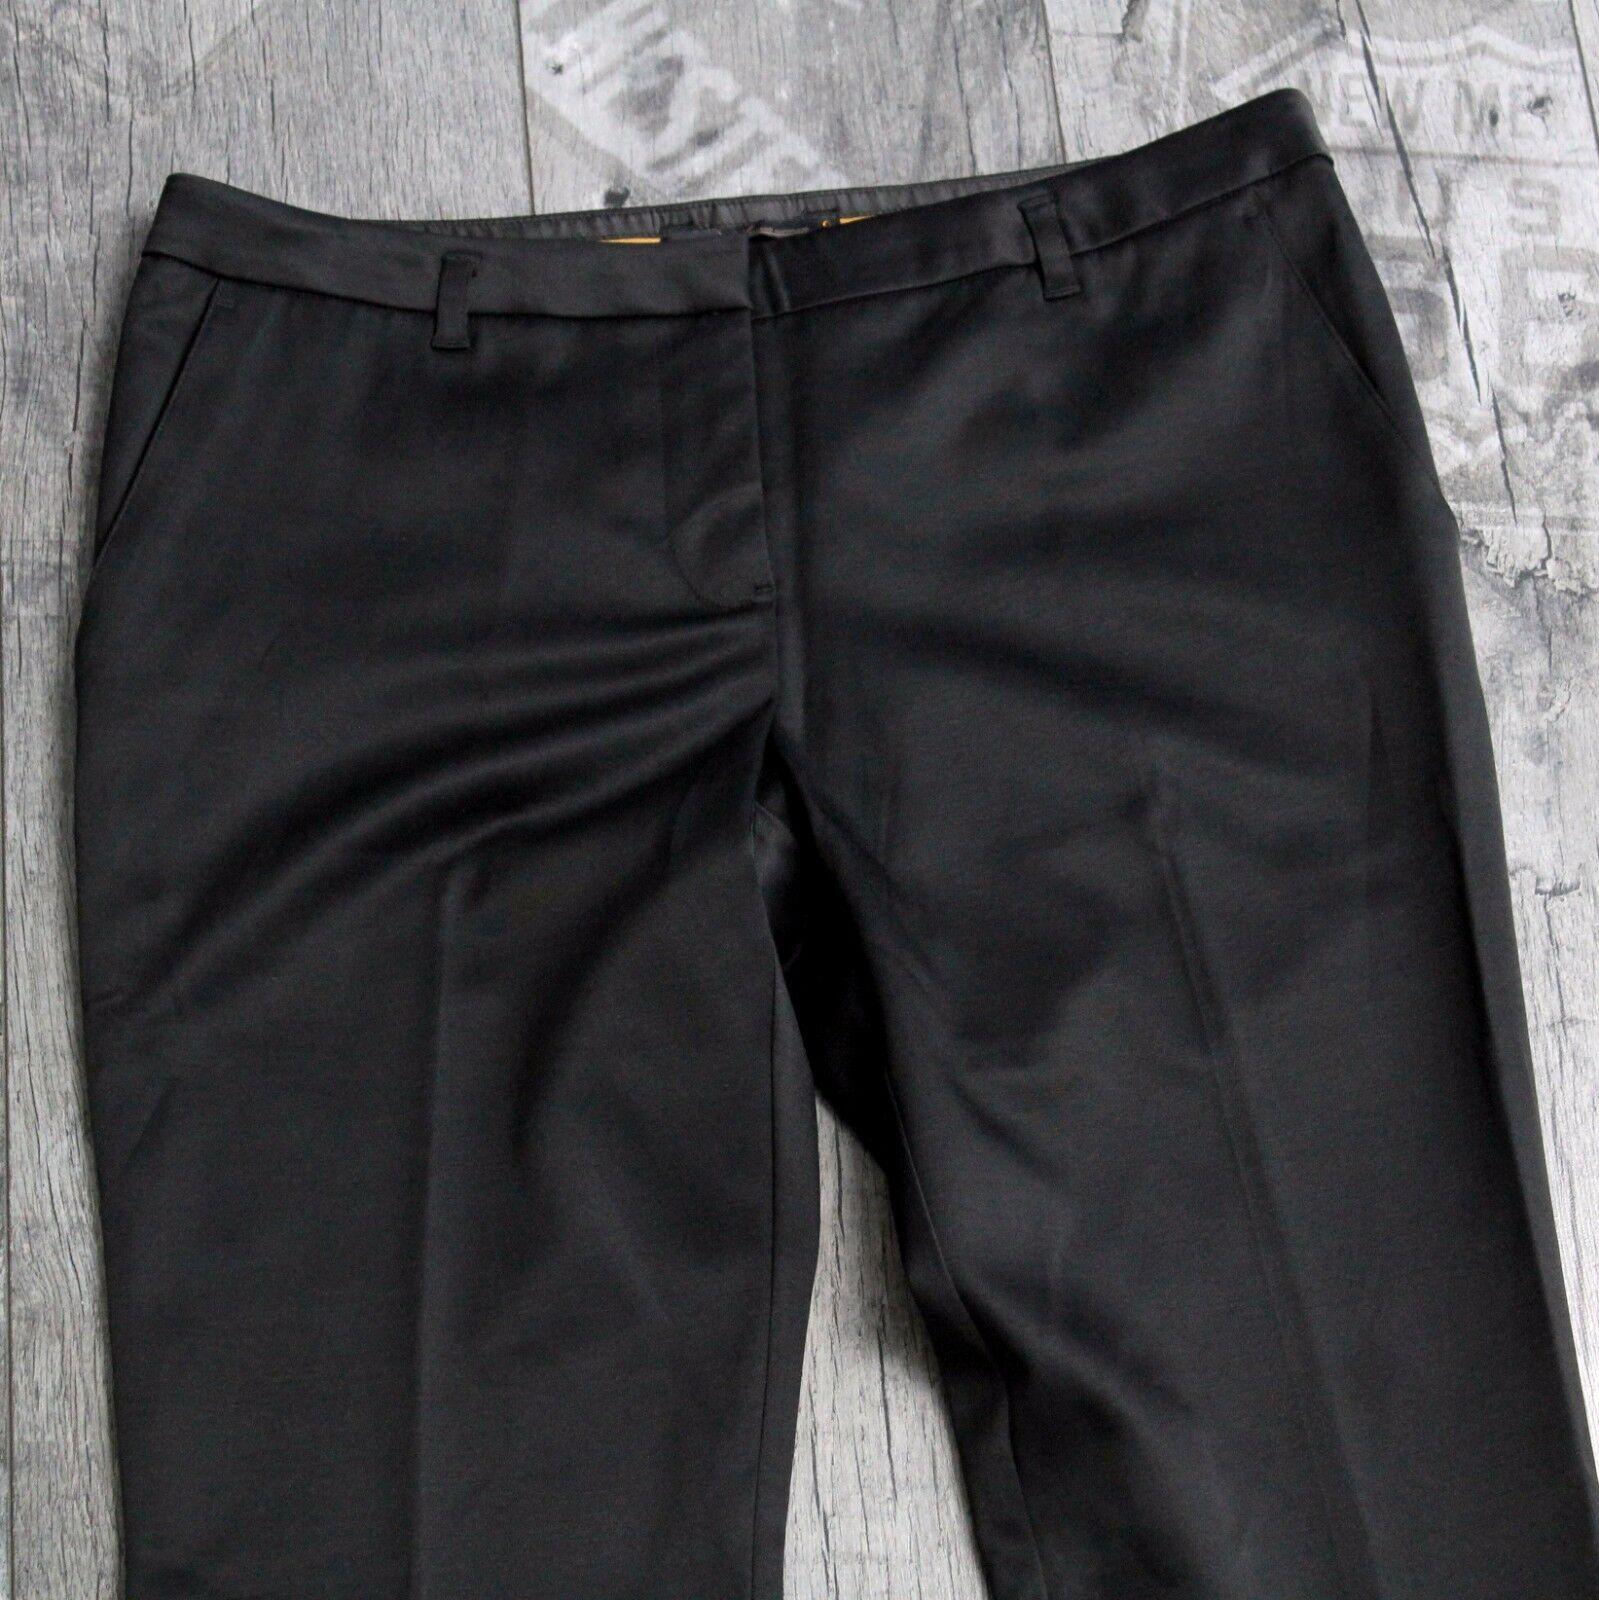 GAUDI Donna Premium Pantaloni Elegante Tg 46 a2560